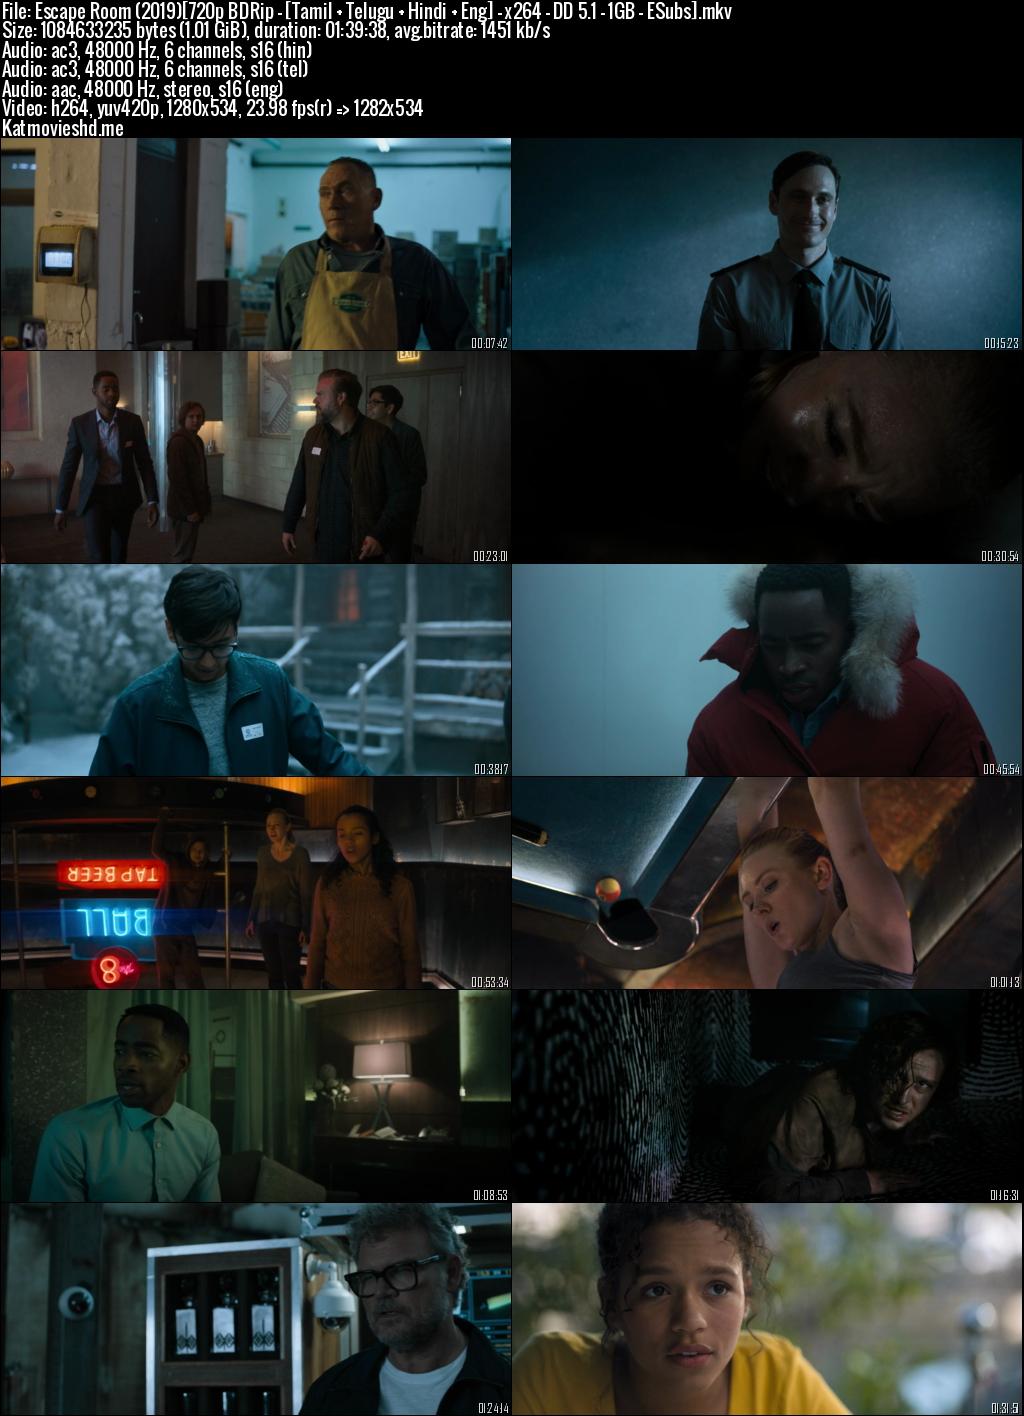 Screenshot of Escape Room 2019 Full Movie Download BDRip 720p